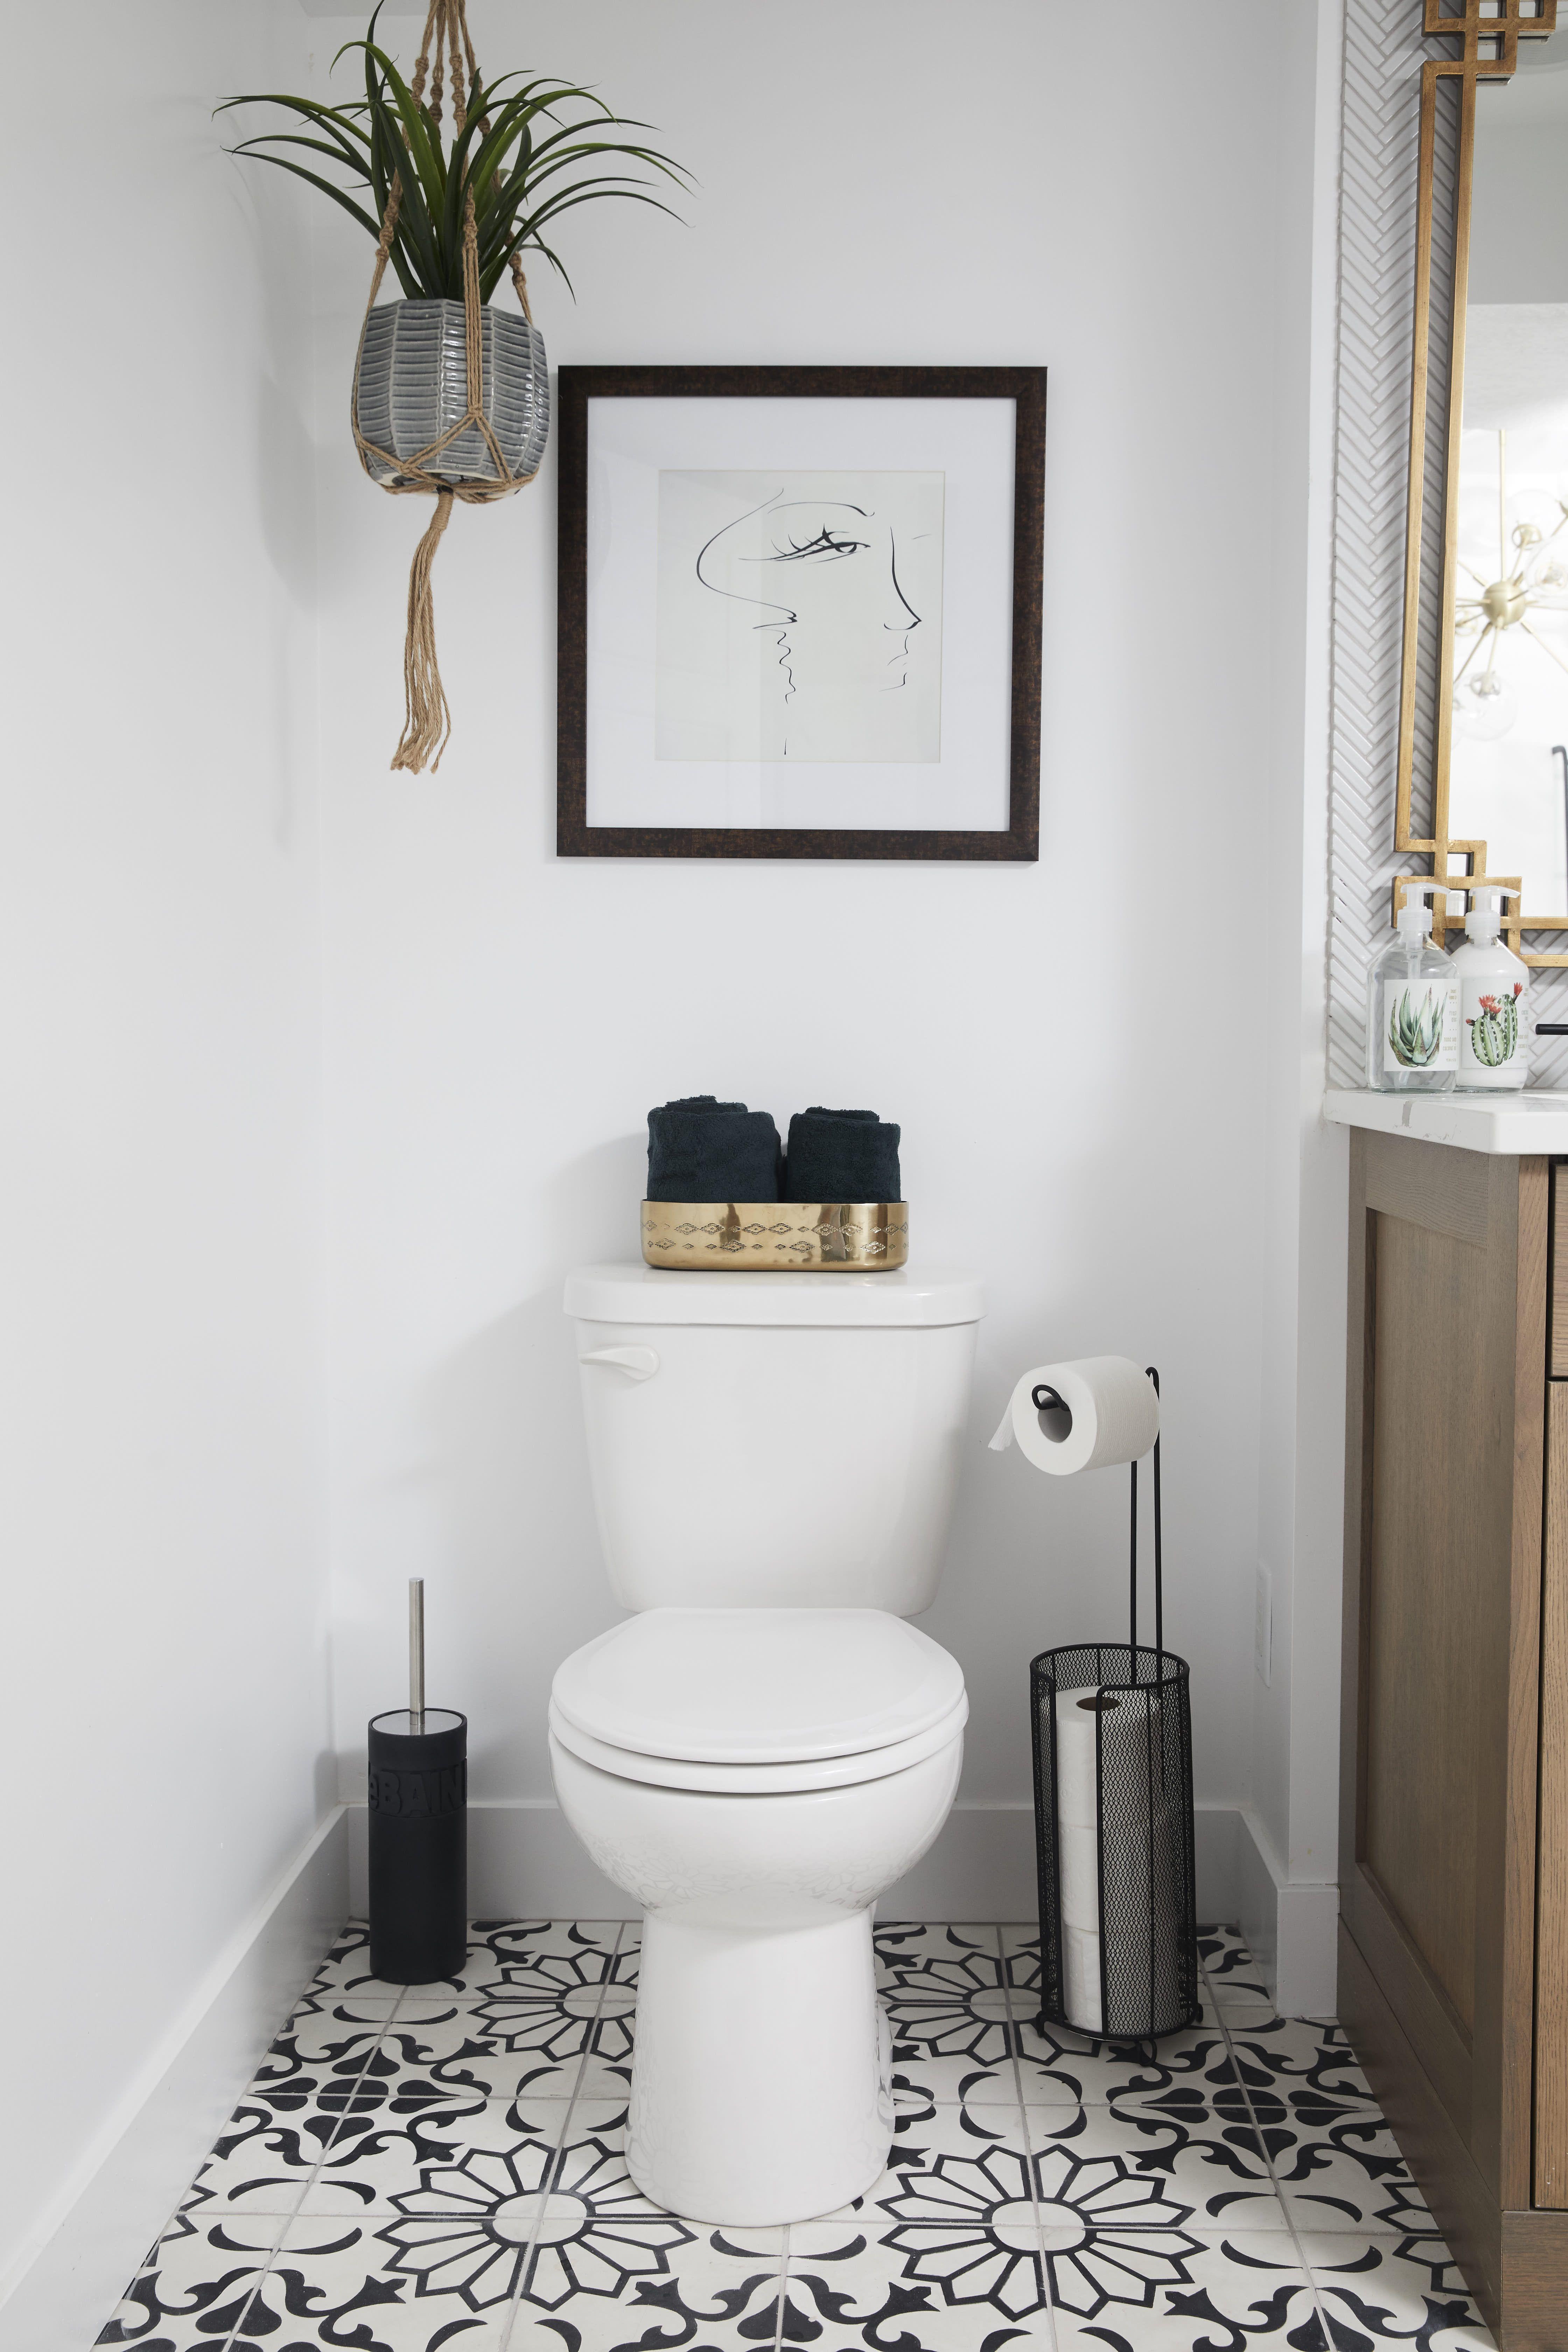 Cara Loren decorative bathroom tile   Home in 2018   Pinterest ...